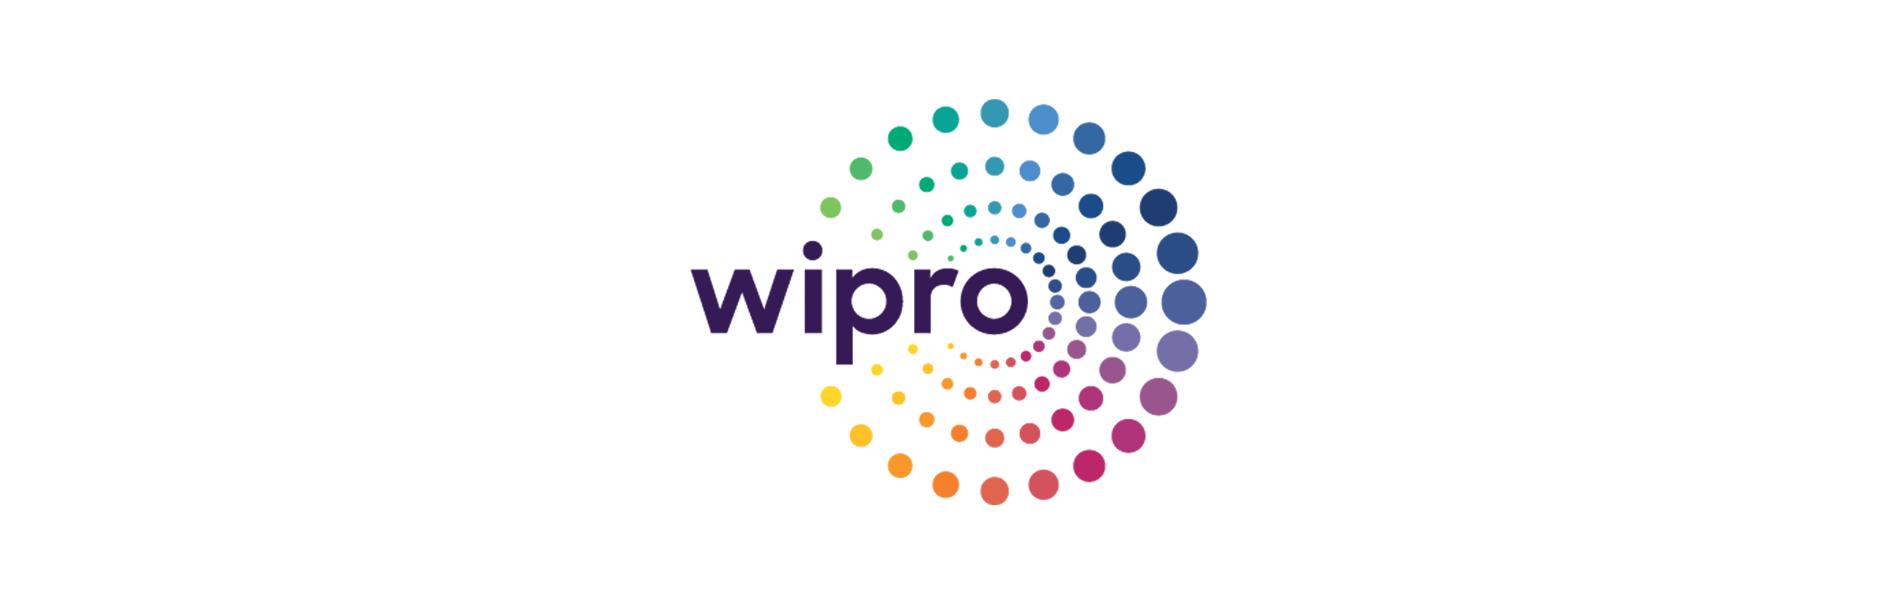 Wipro Ltd. logo